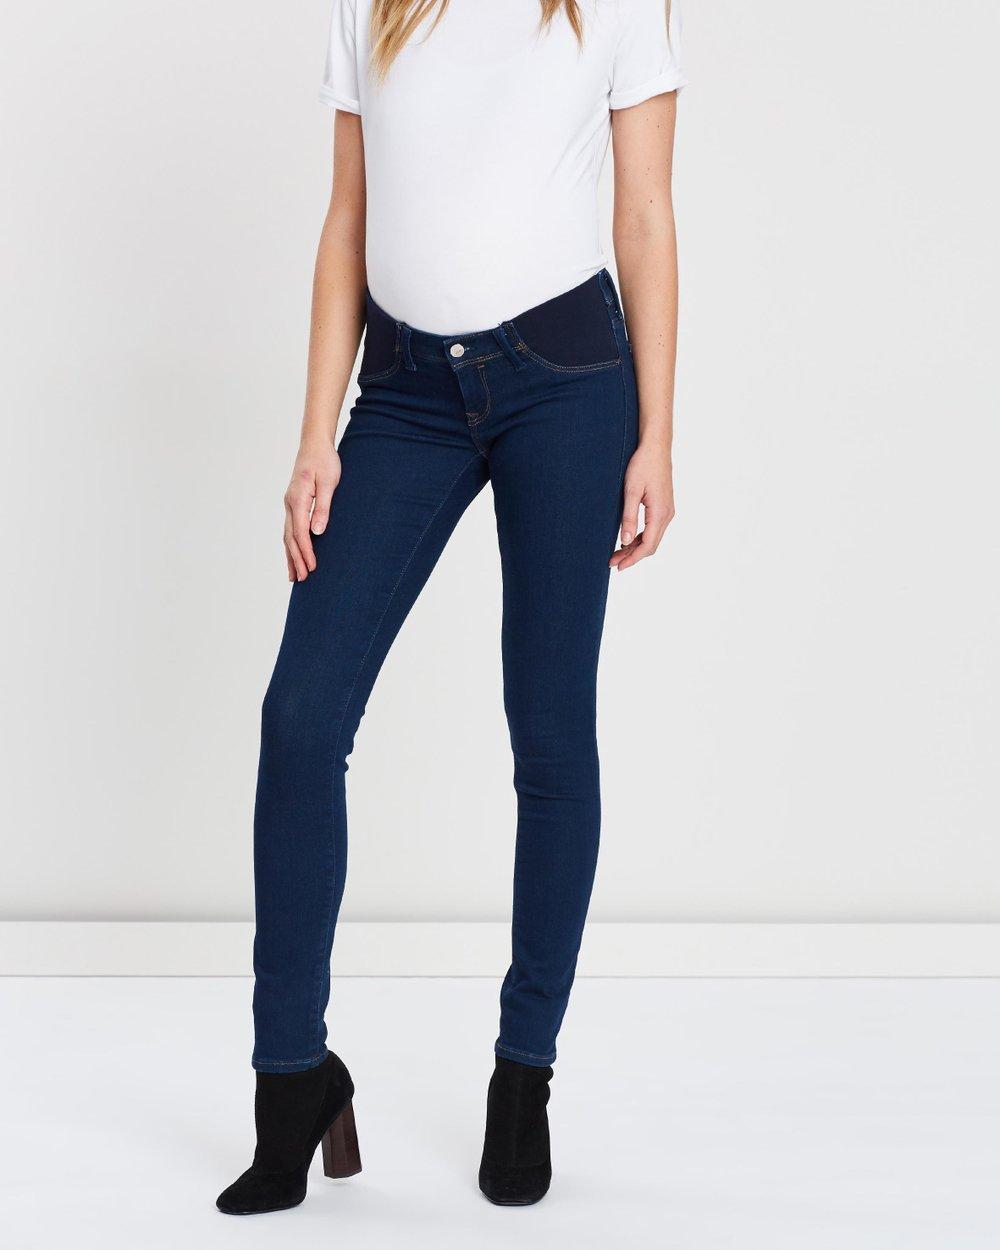 Reina Maternity Jeans By Mavi Online Gov Australia